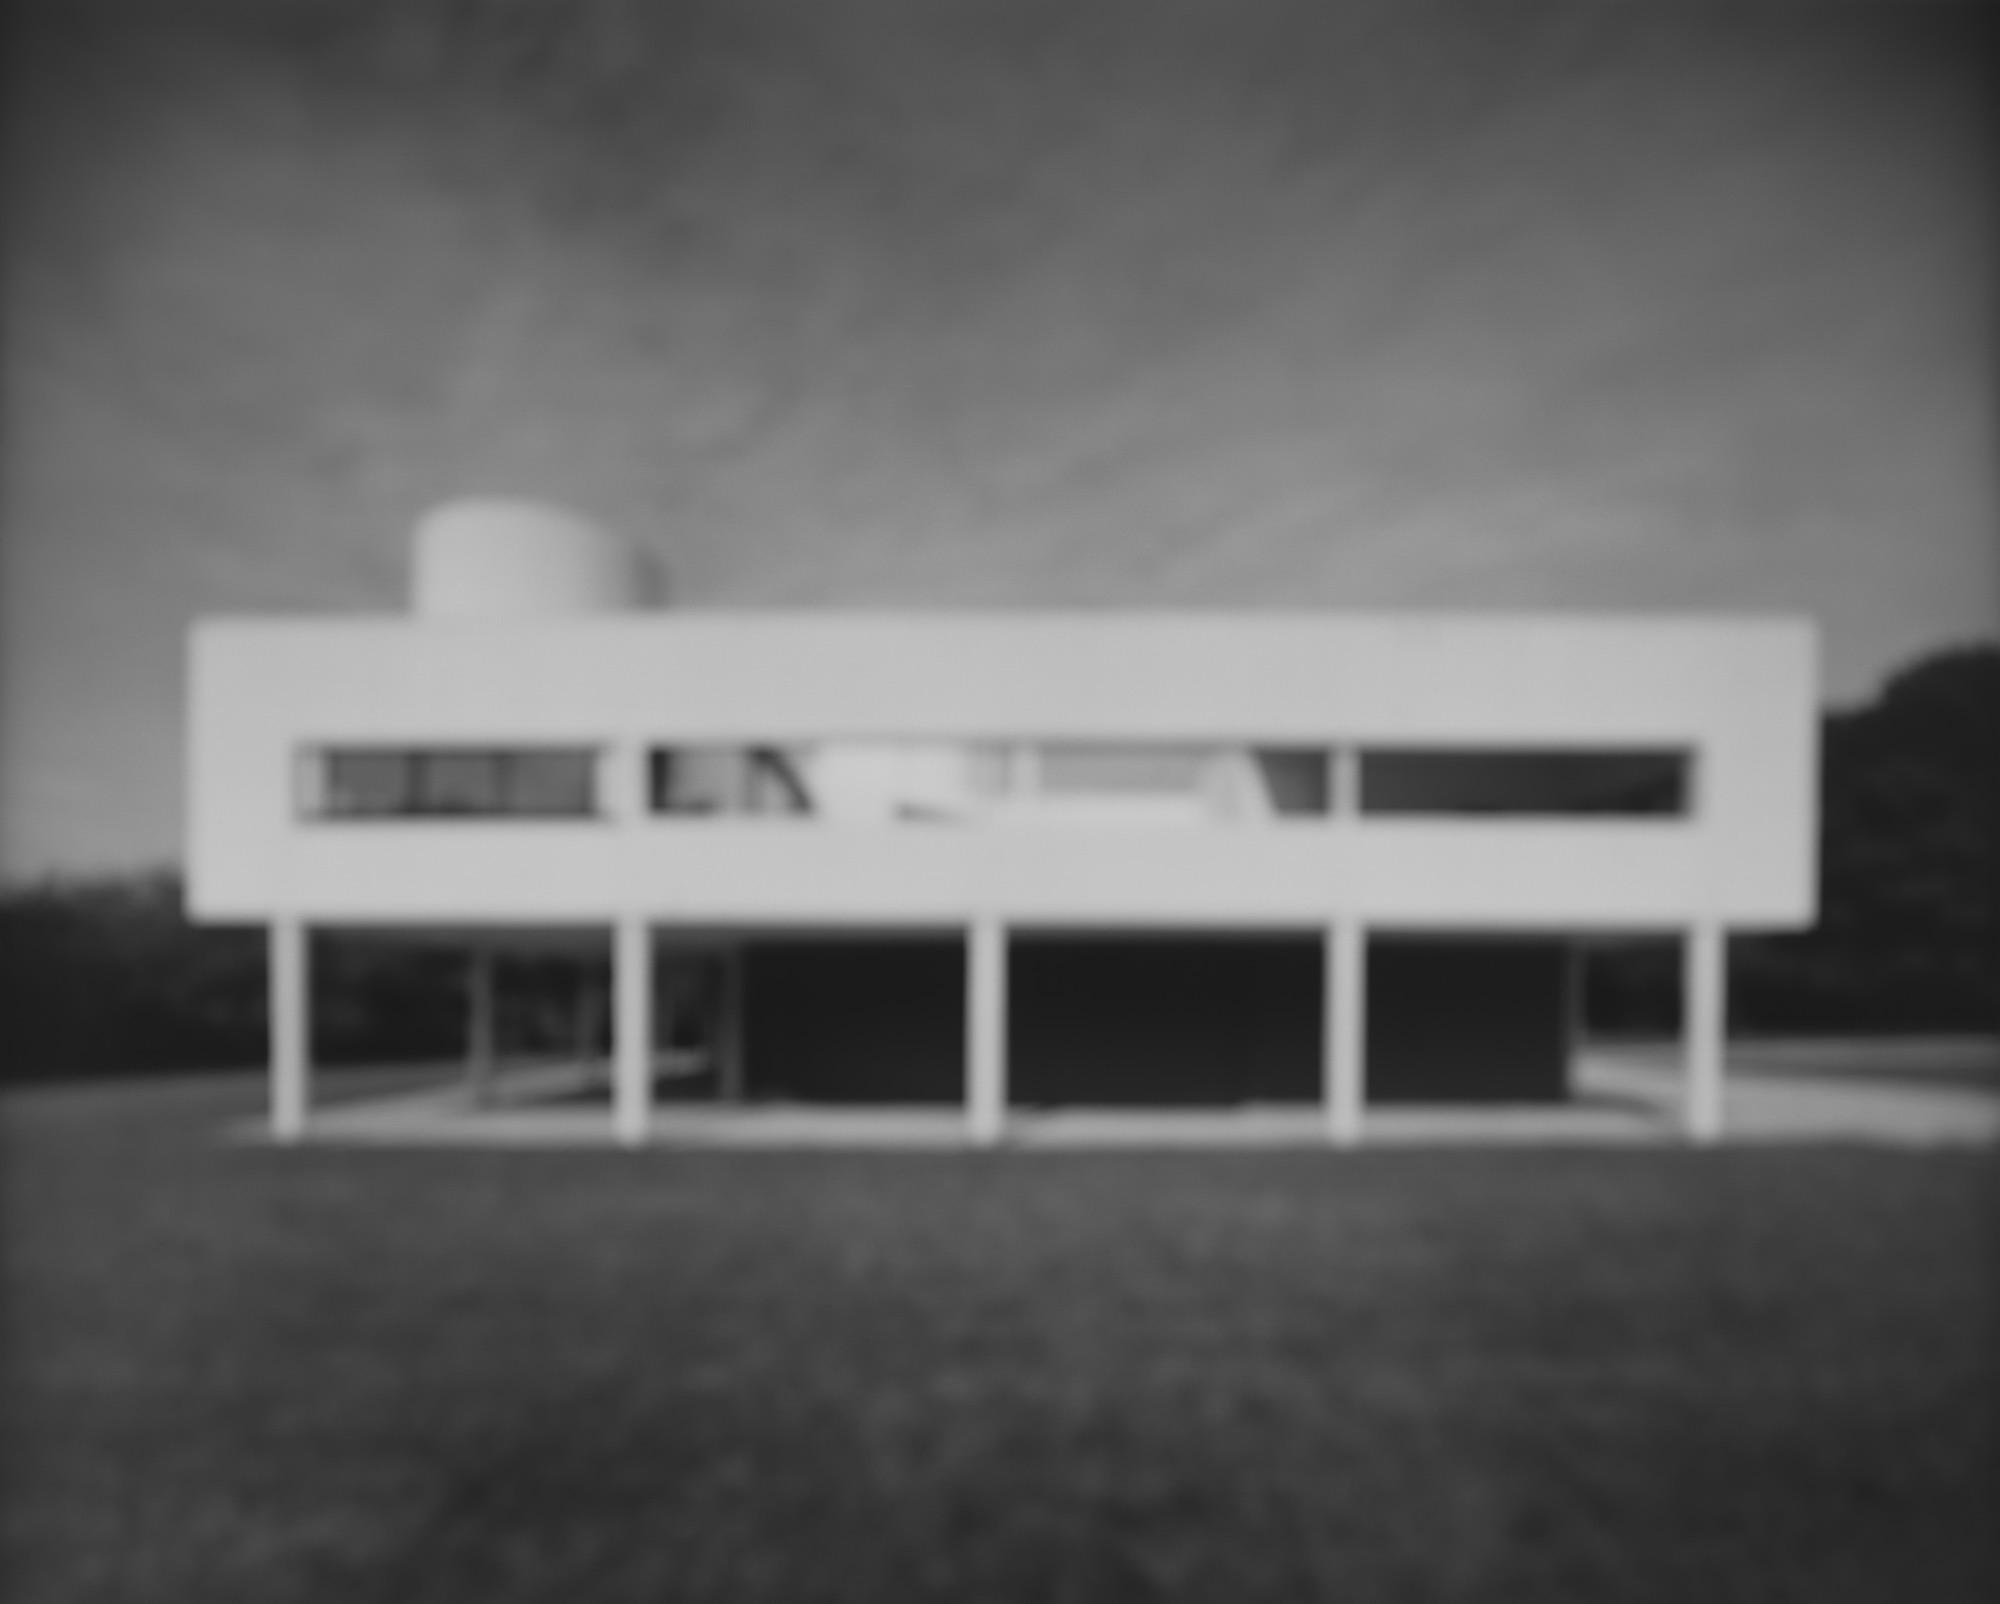 Hiroshi Sugimoto, Villa Savoye Le Corbusier, 1998